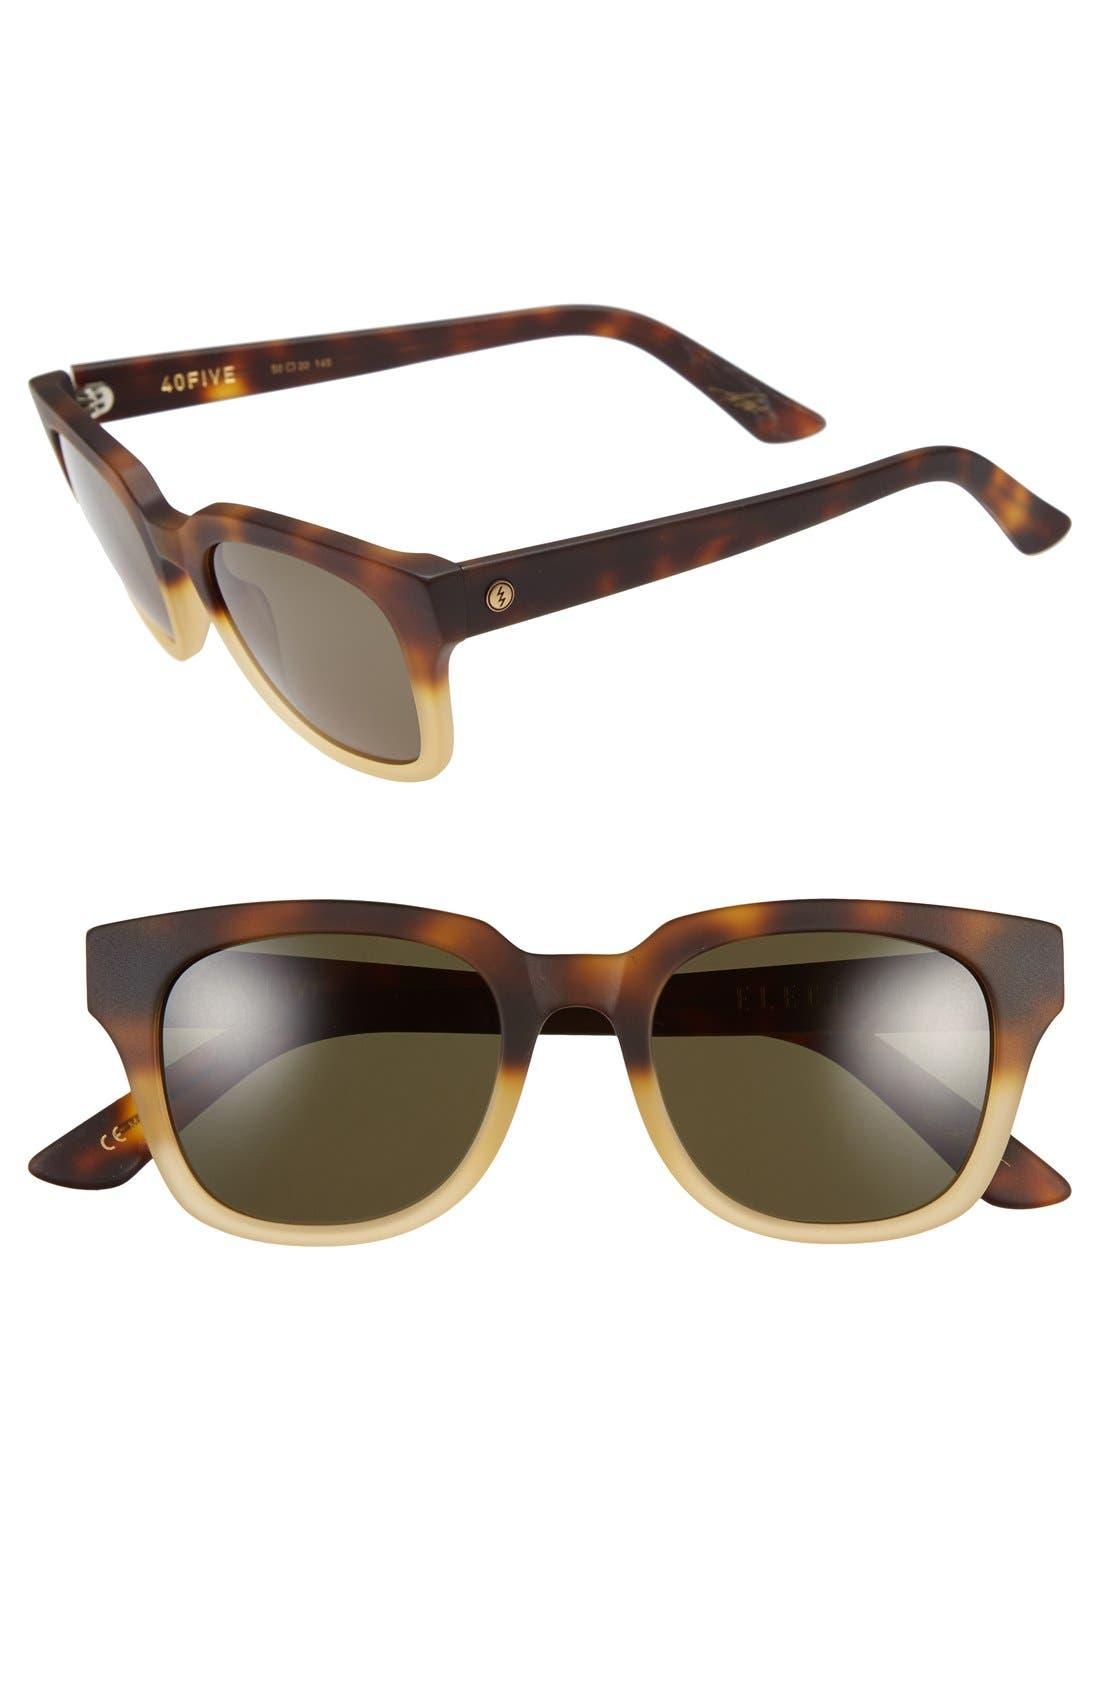 ELECTRIC 40Five 50mm Sunglasses